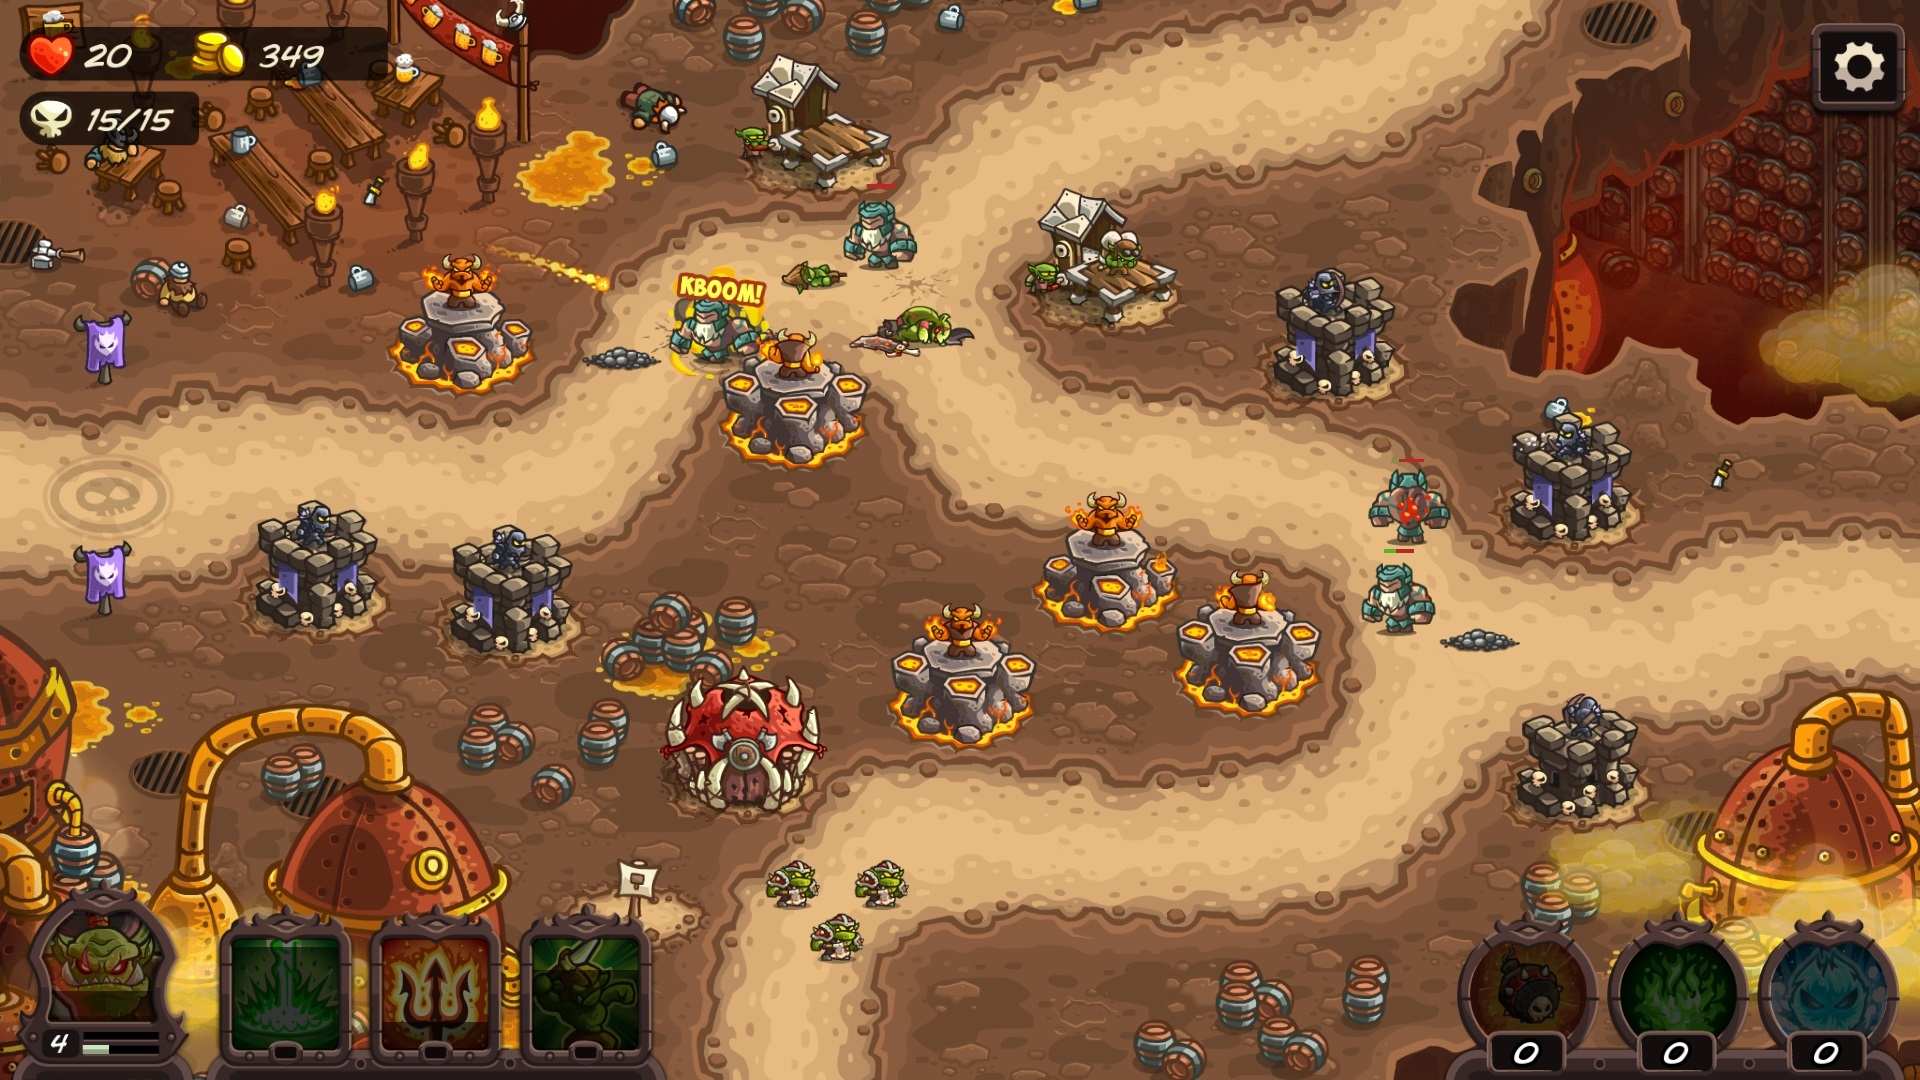 Kingdom rush vengeance - tower defense playbook